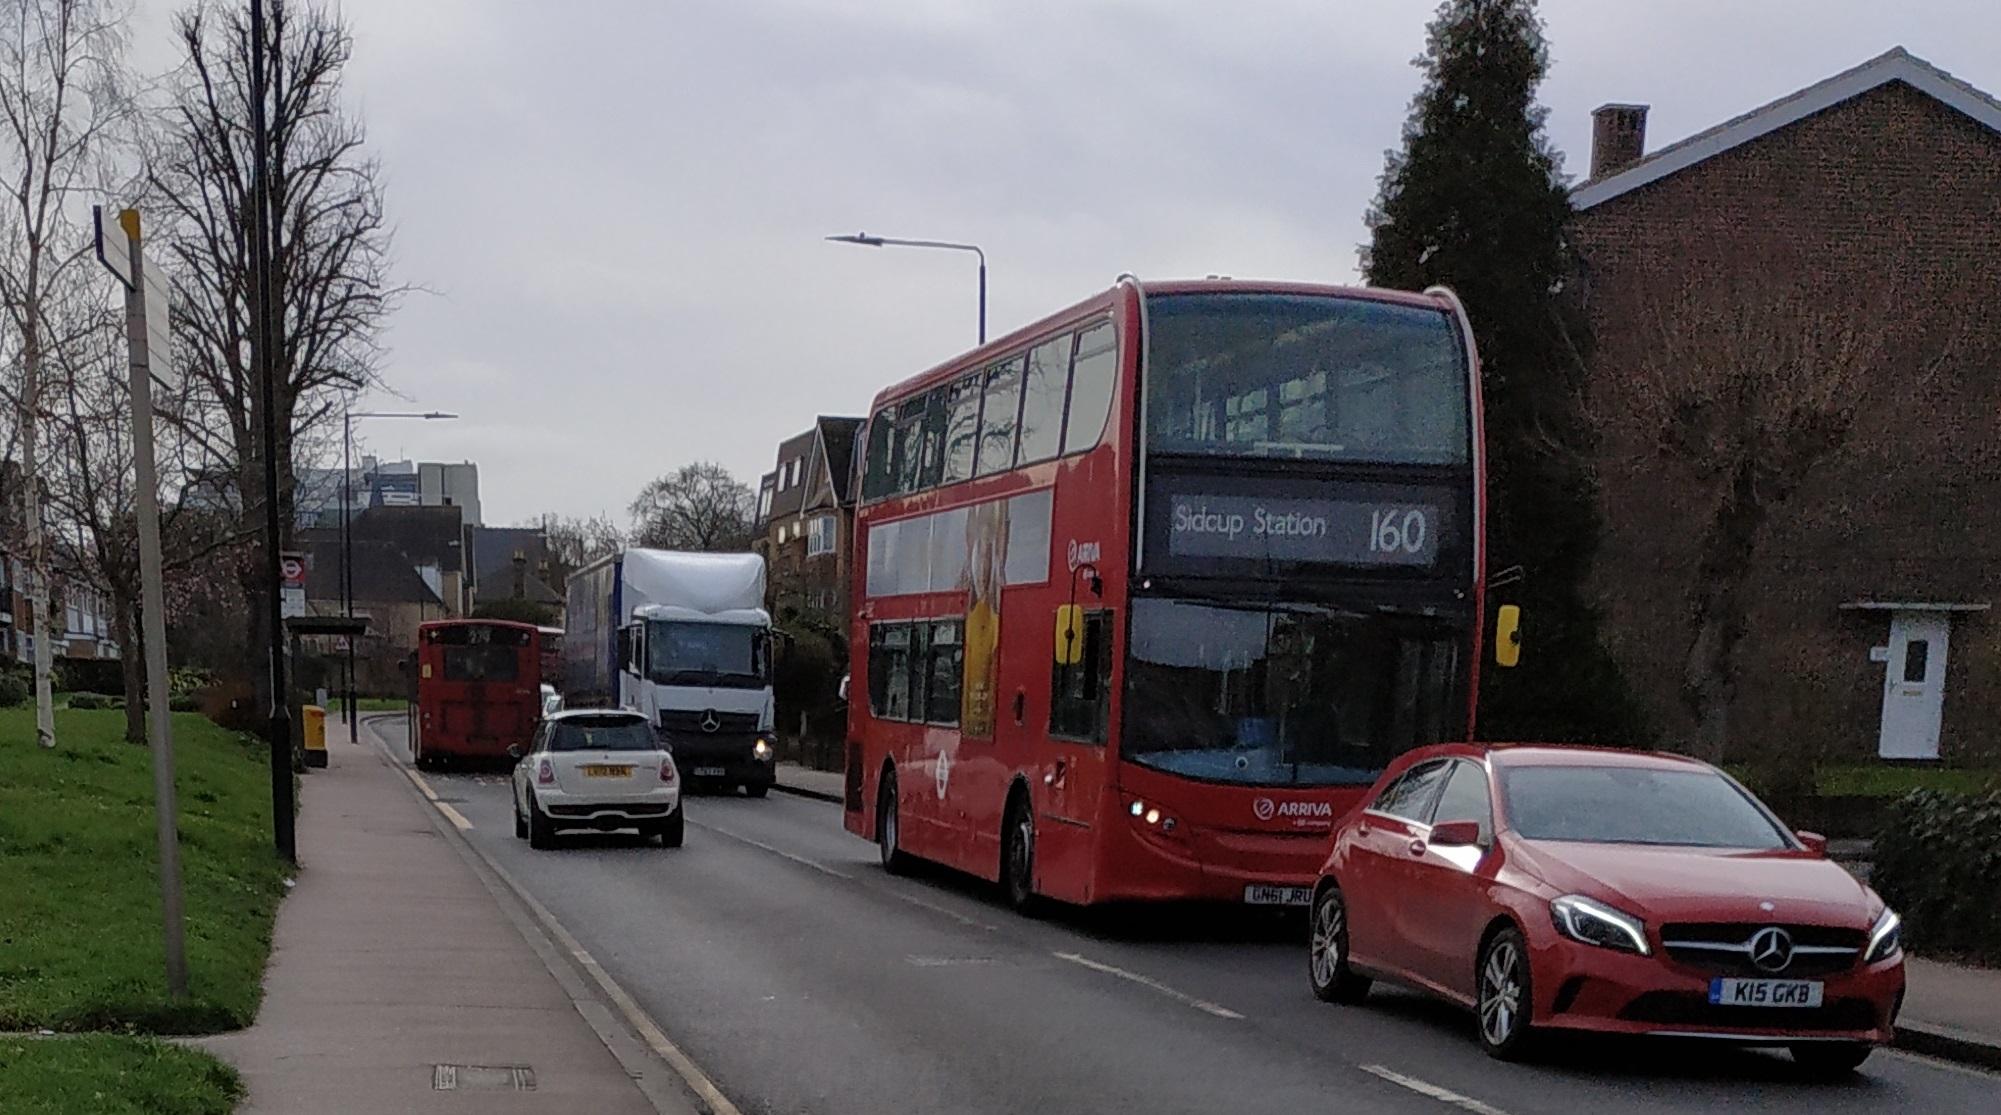 Bus Hopper transfer time cut by Transport For London